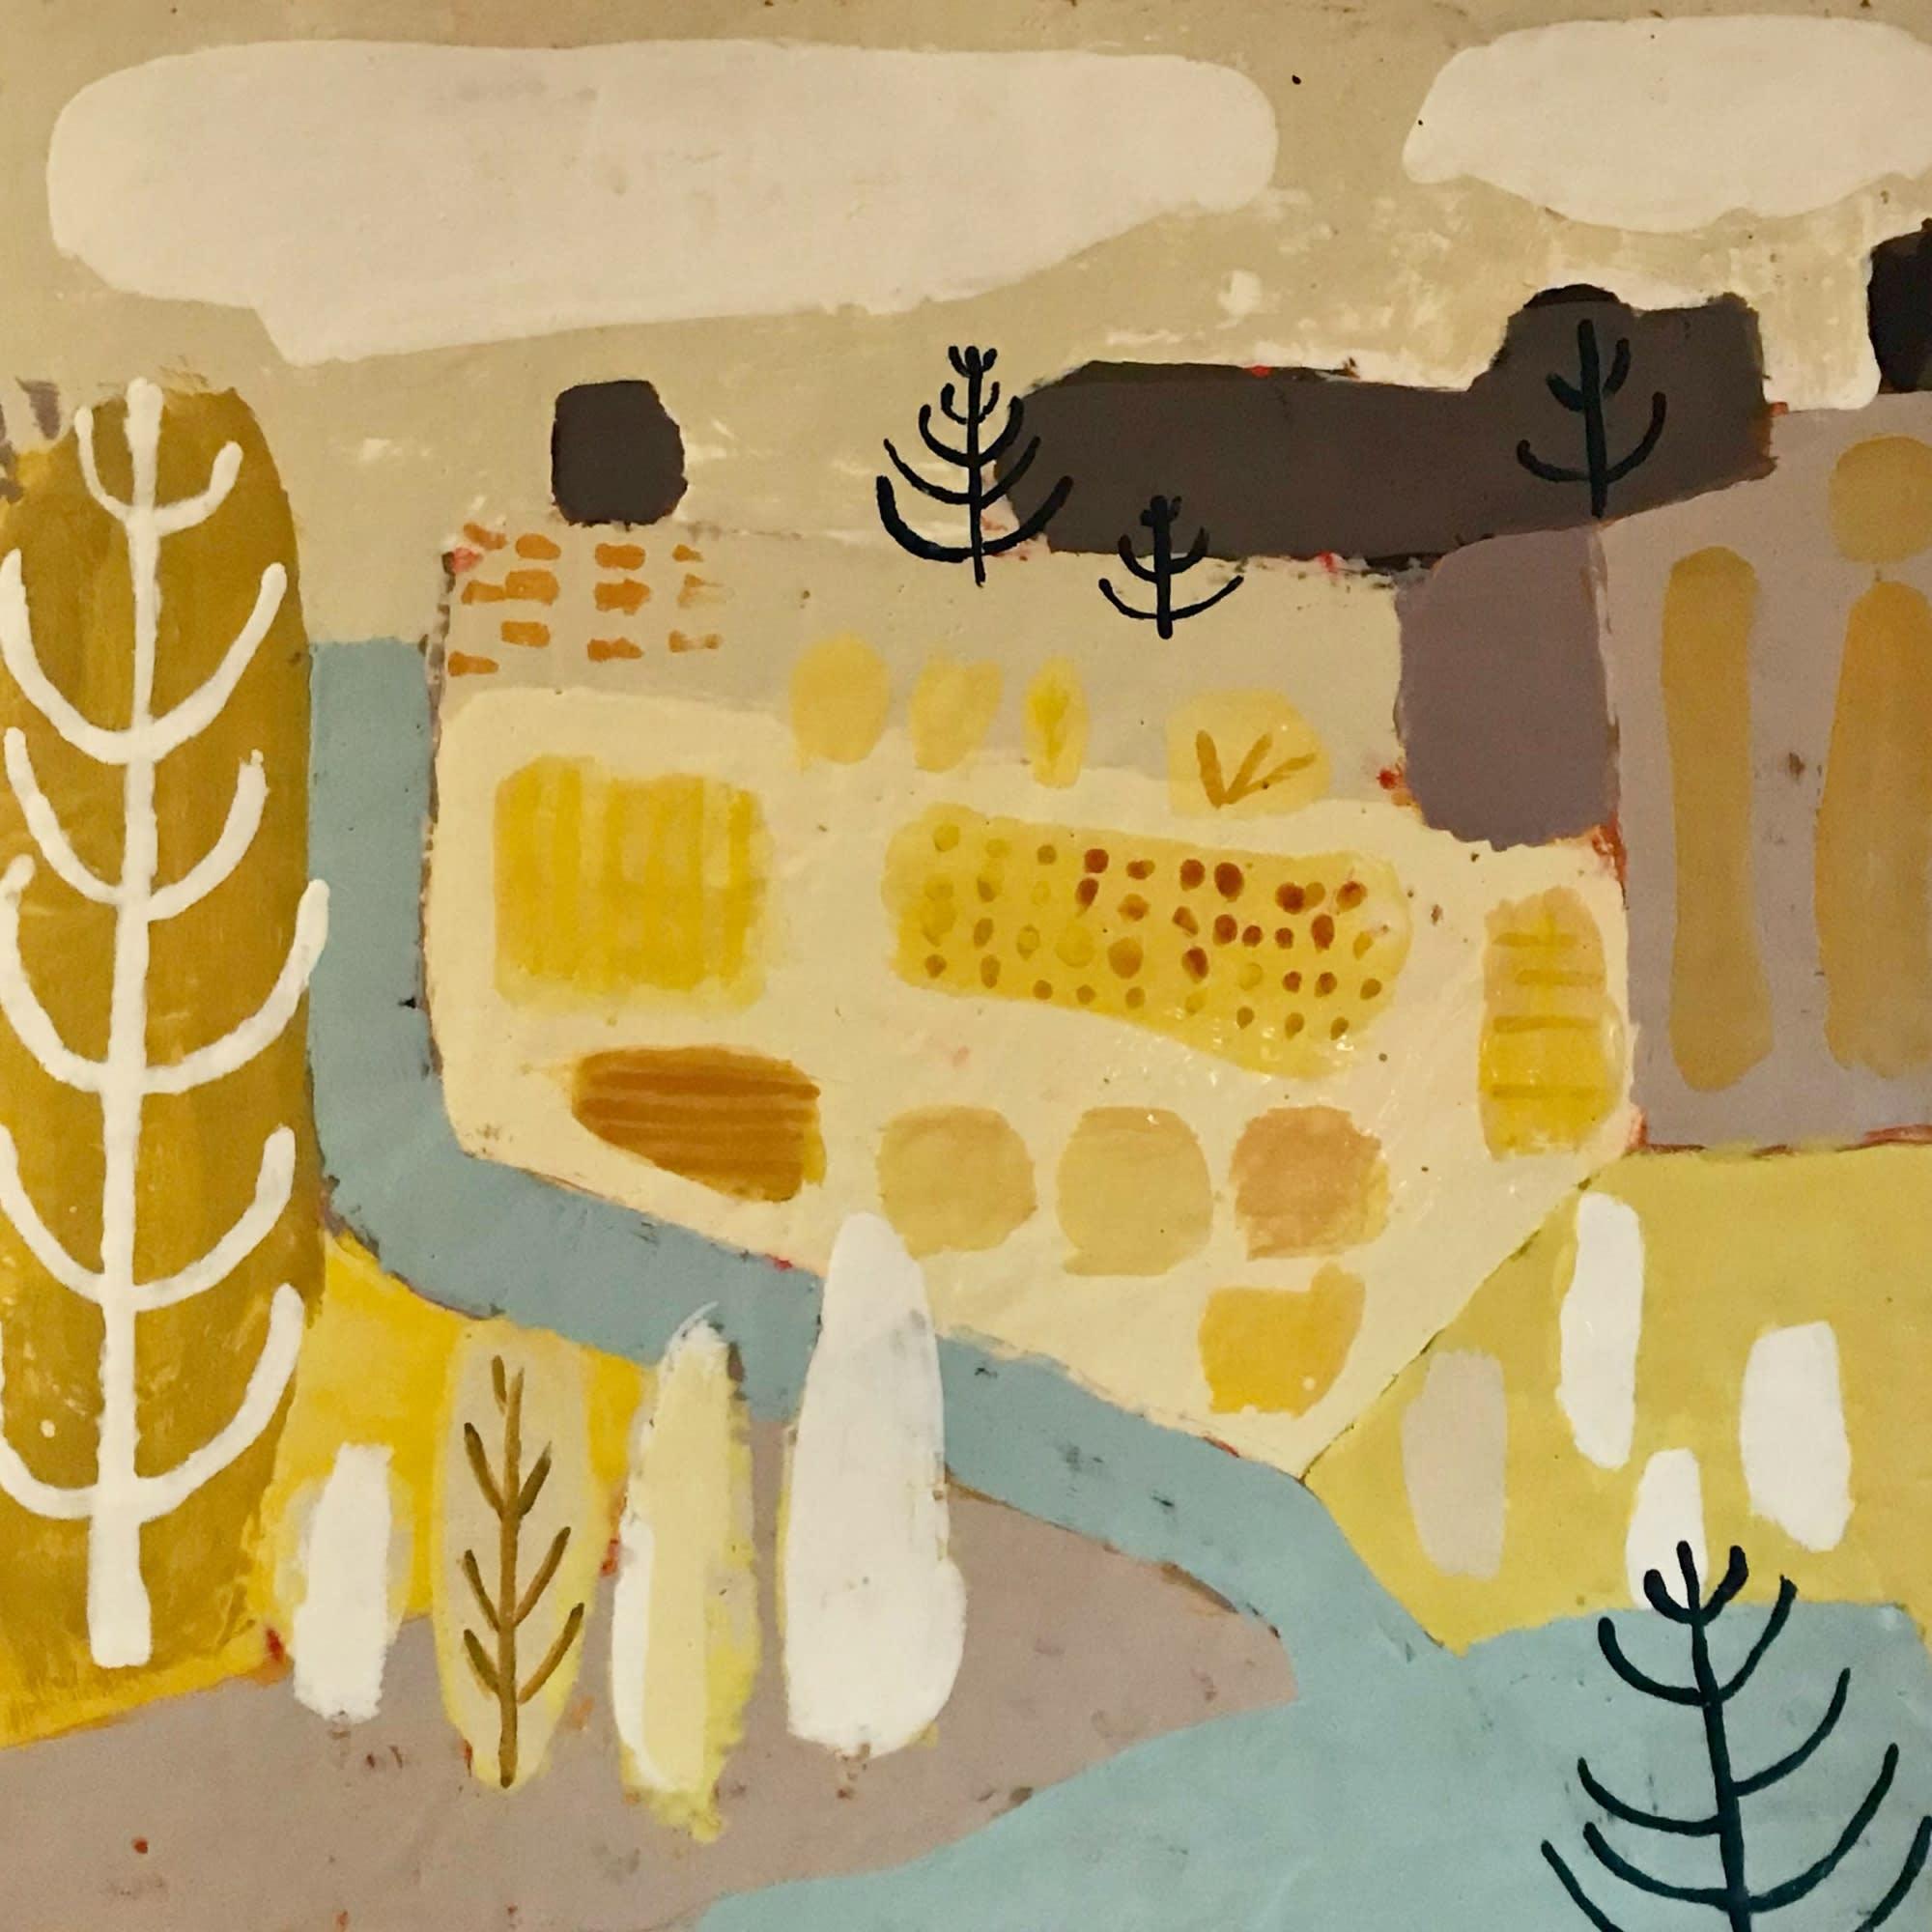 'Something From Nothing' by Deborah Eyde at Gallery 133